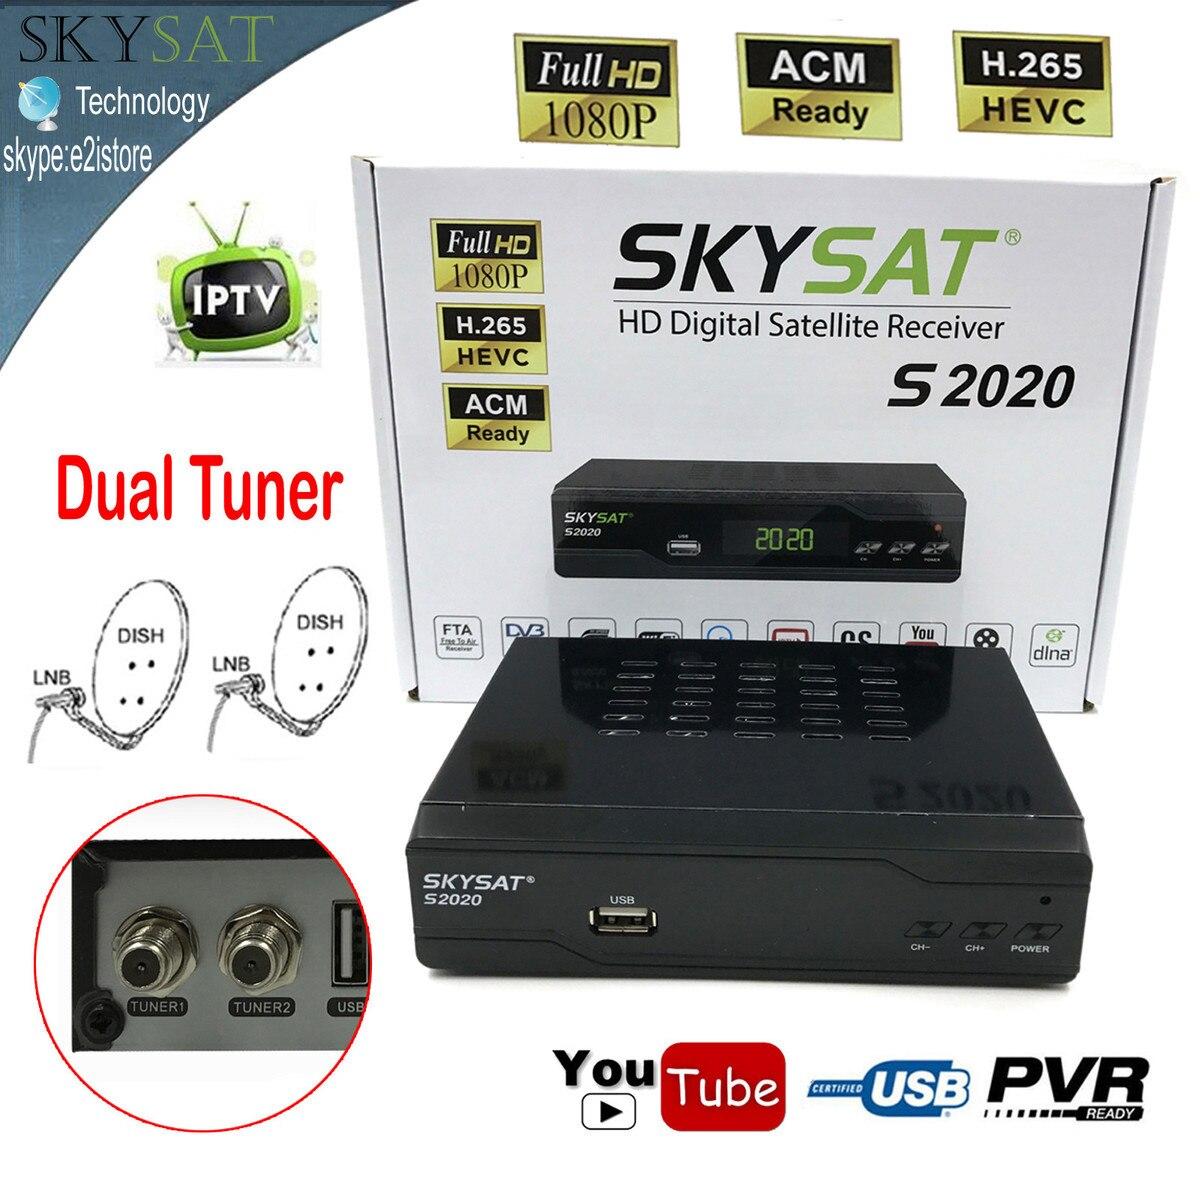 Skysat Dual Dish Twin Tuner H.265 AVC MPEG-4 Digital Satellite Receiver ACM Support IKS SKS ACM/VCM/CCM IPTV VOD with LAN Wifi az american s930a twin tuner satellite receiver for south america nagra3